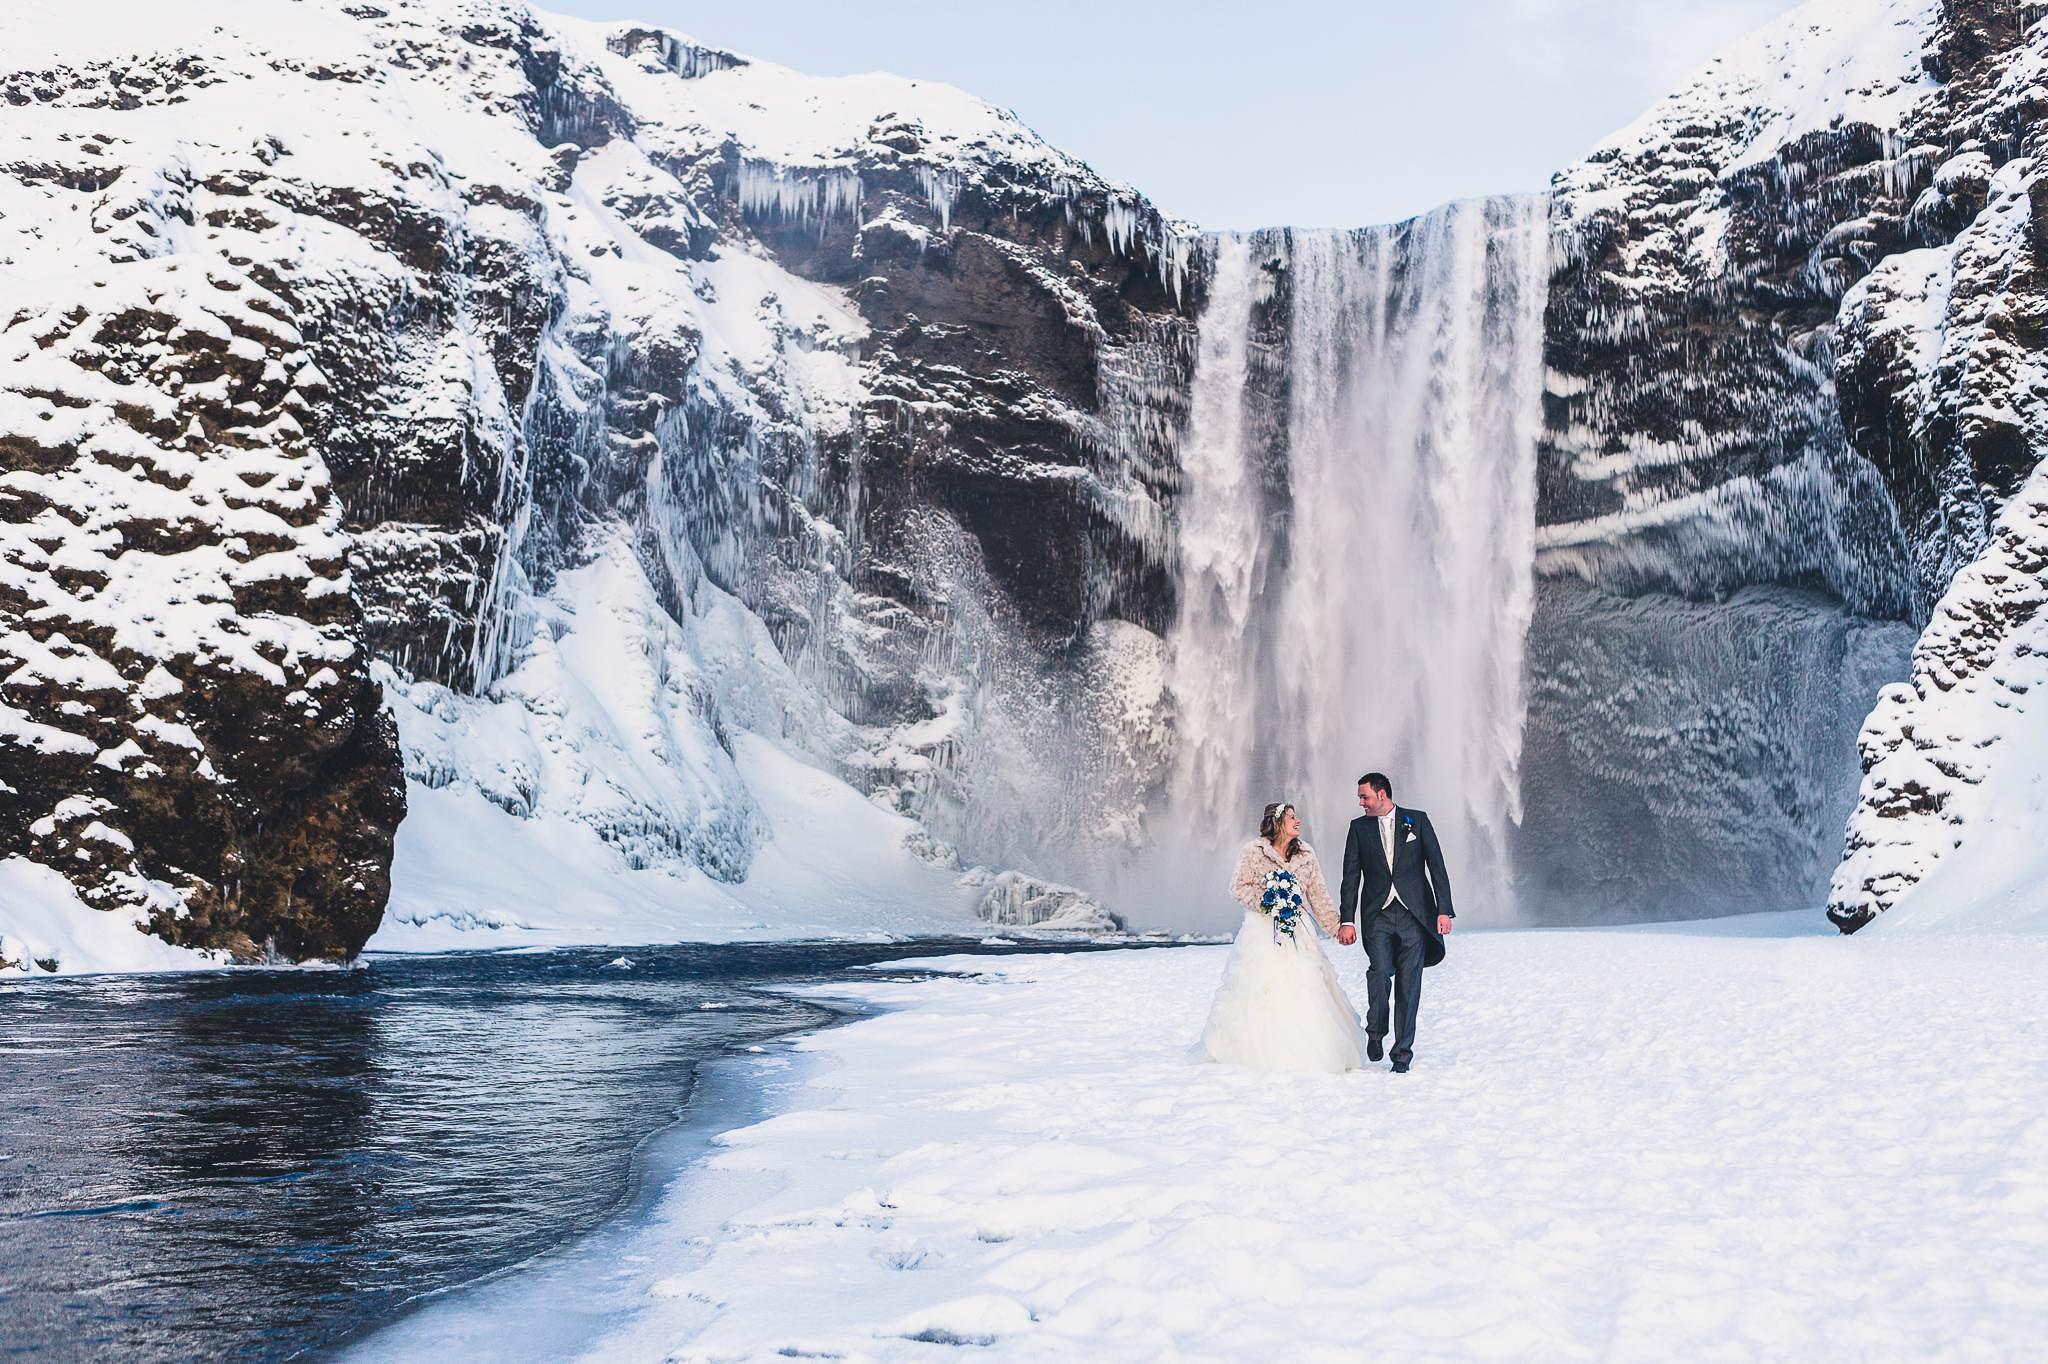 iceland-wedding-photographer-121.jpg